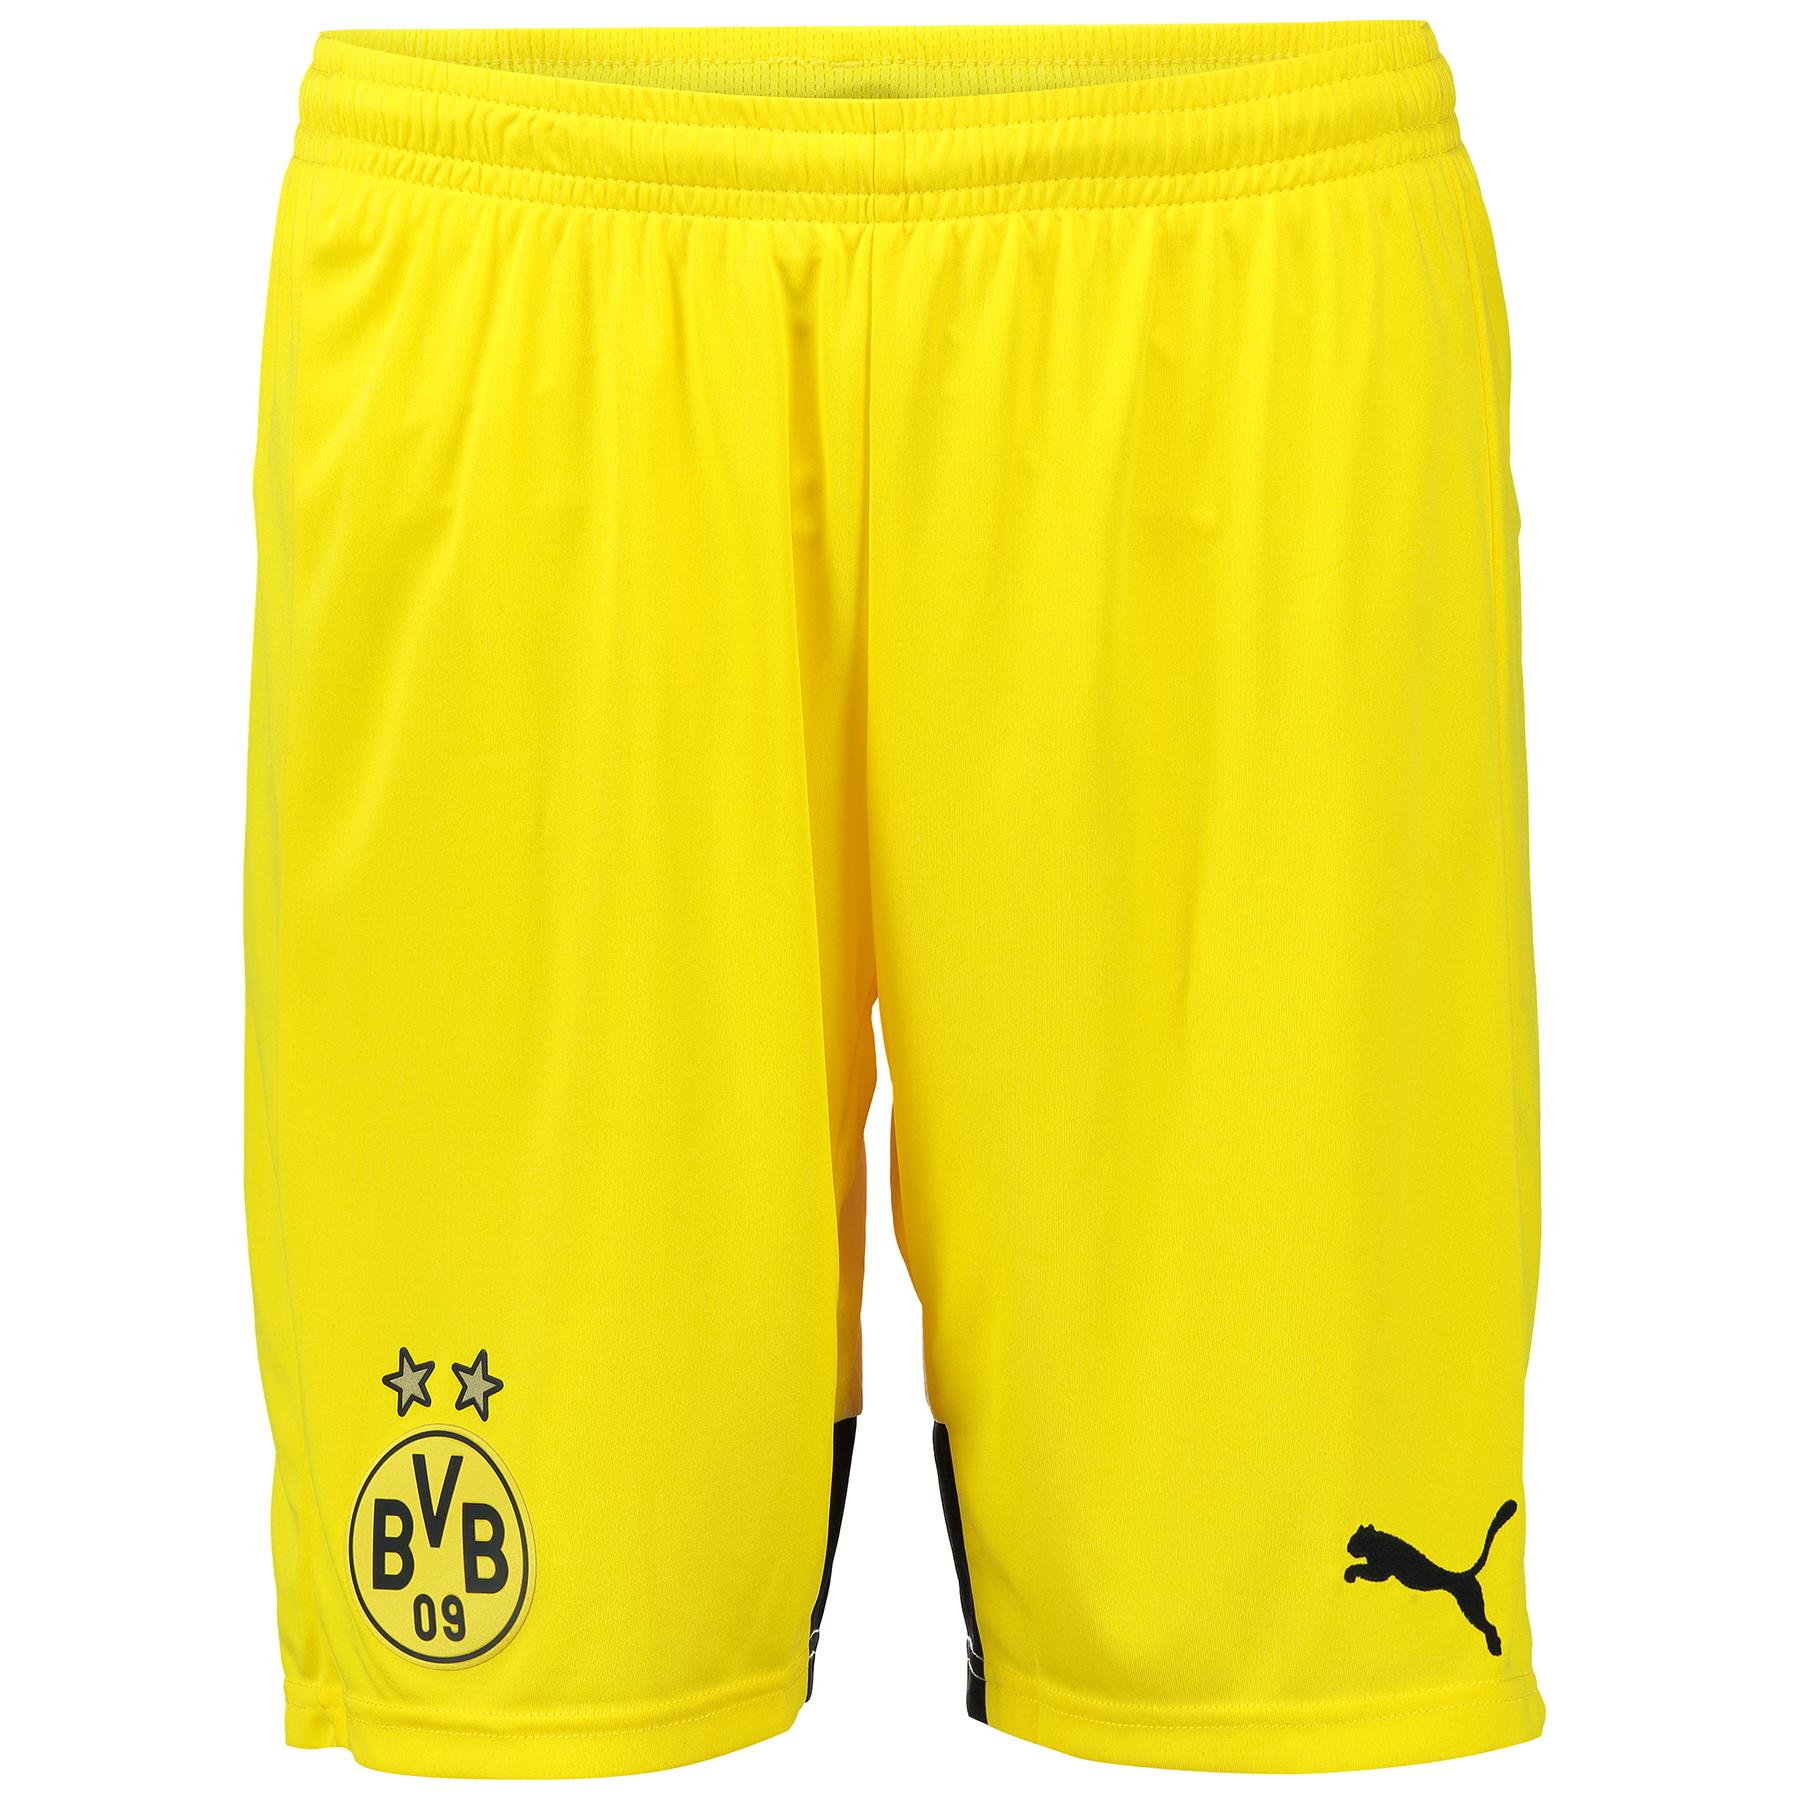 BVB Ambassador Home Shorts 2015/16 – Kids Yellow